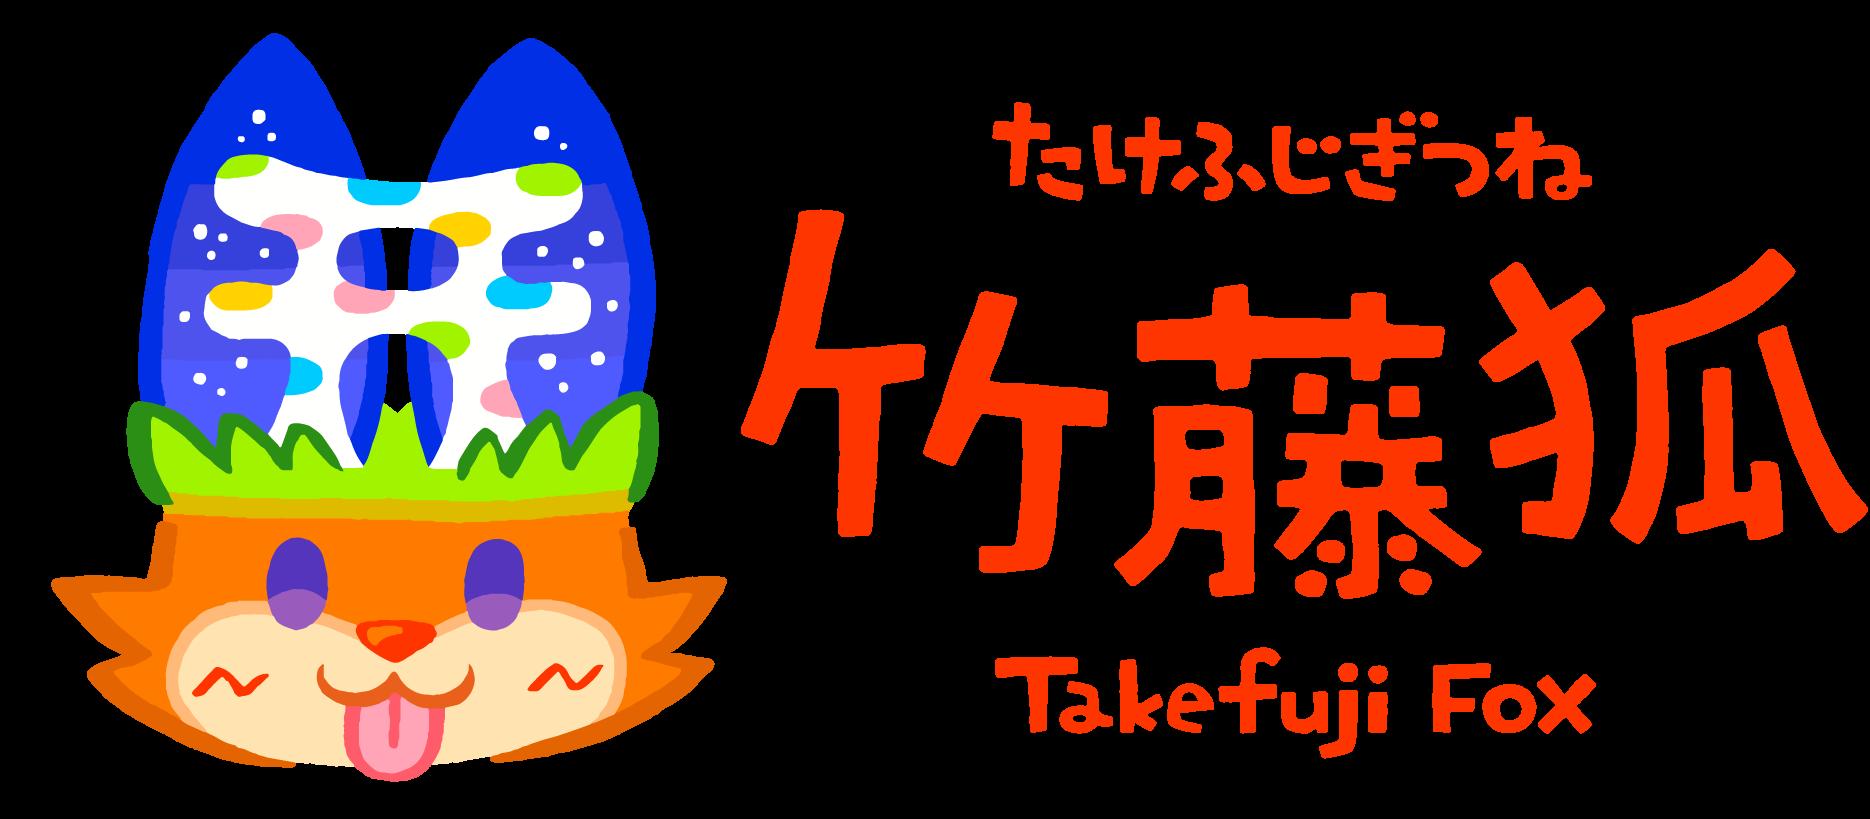 竹藤狐/Takefuji